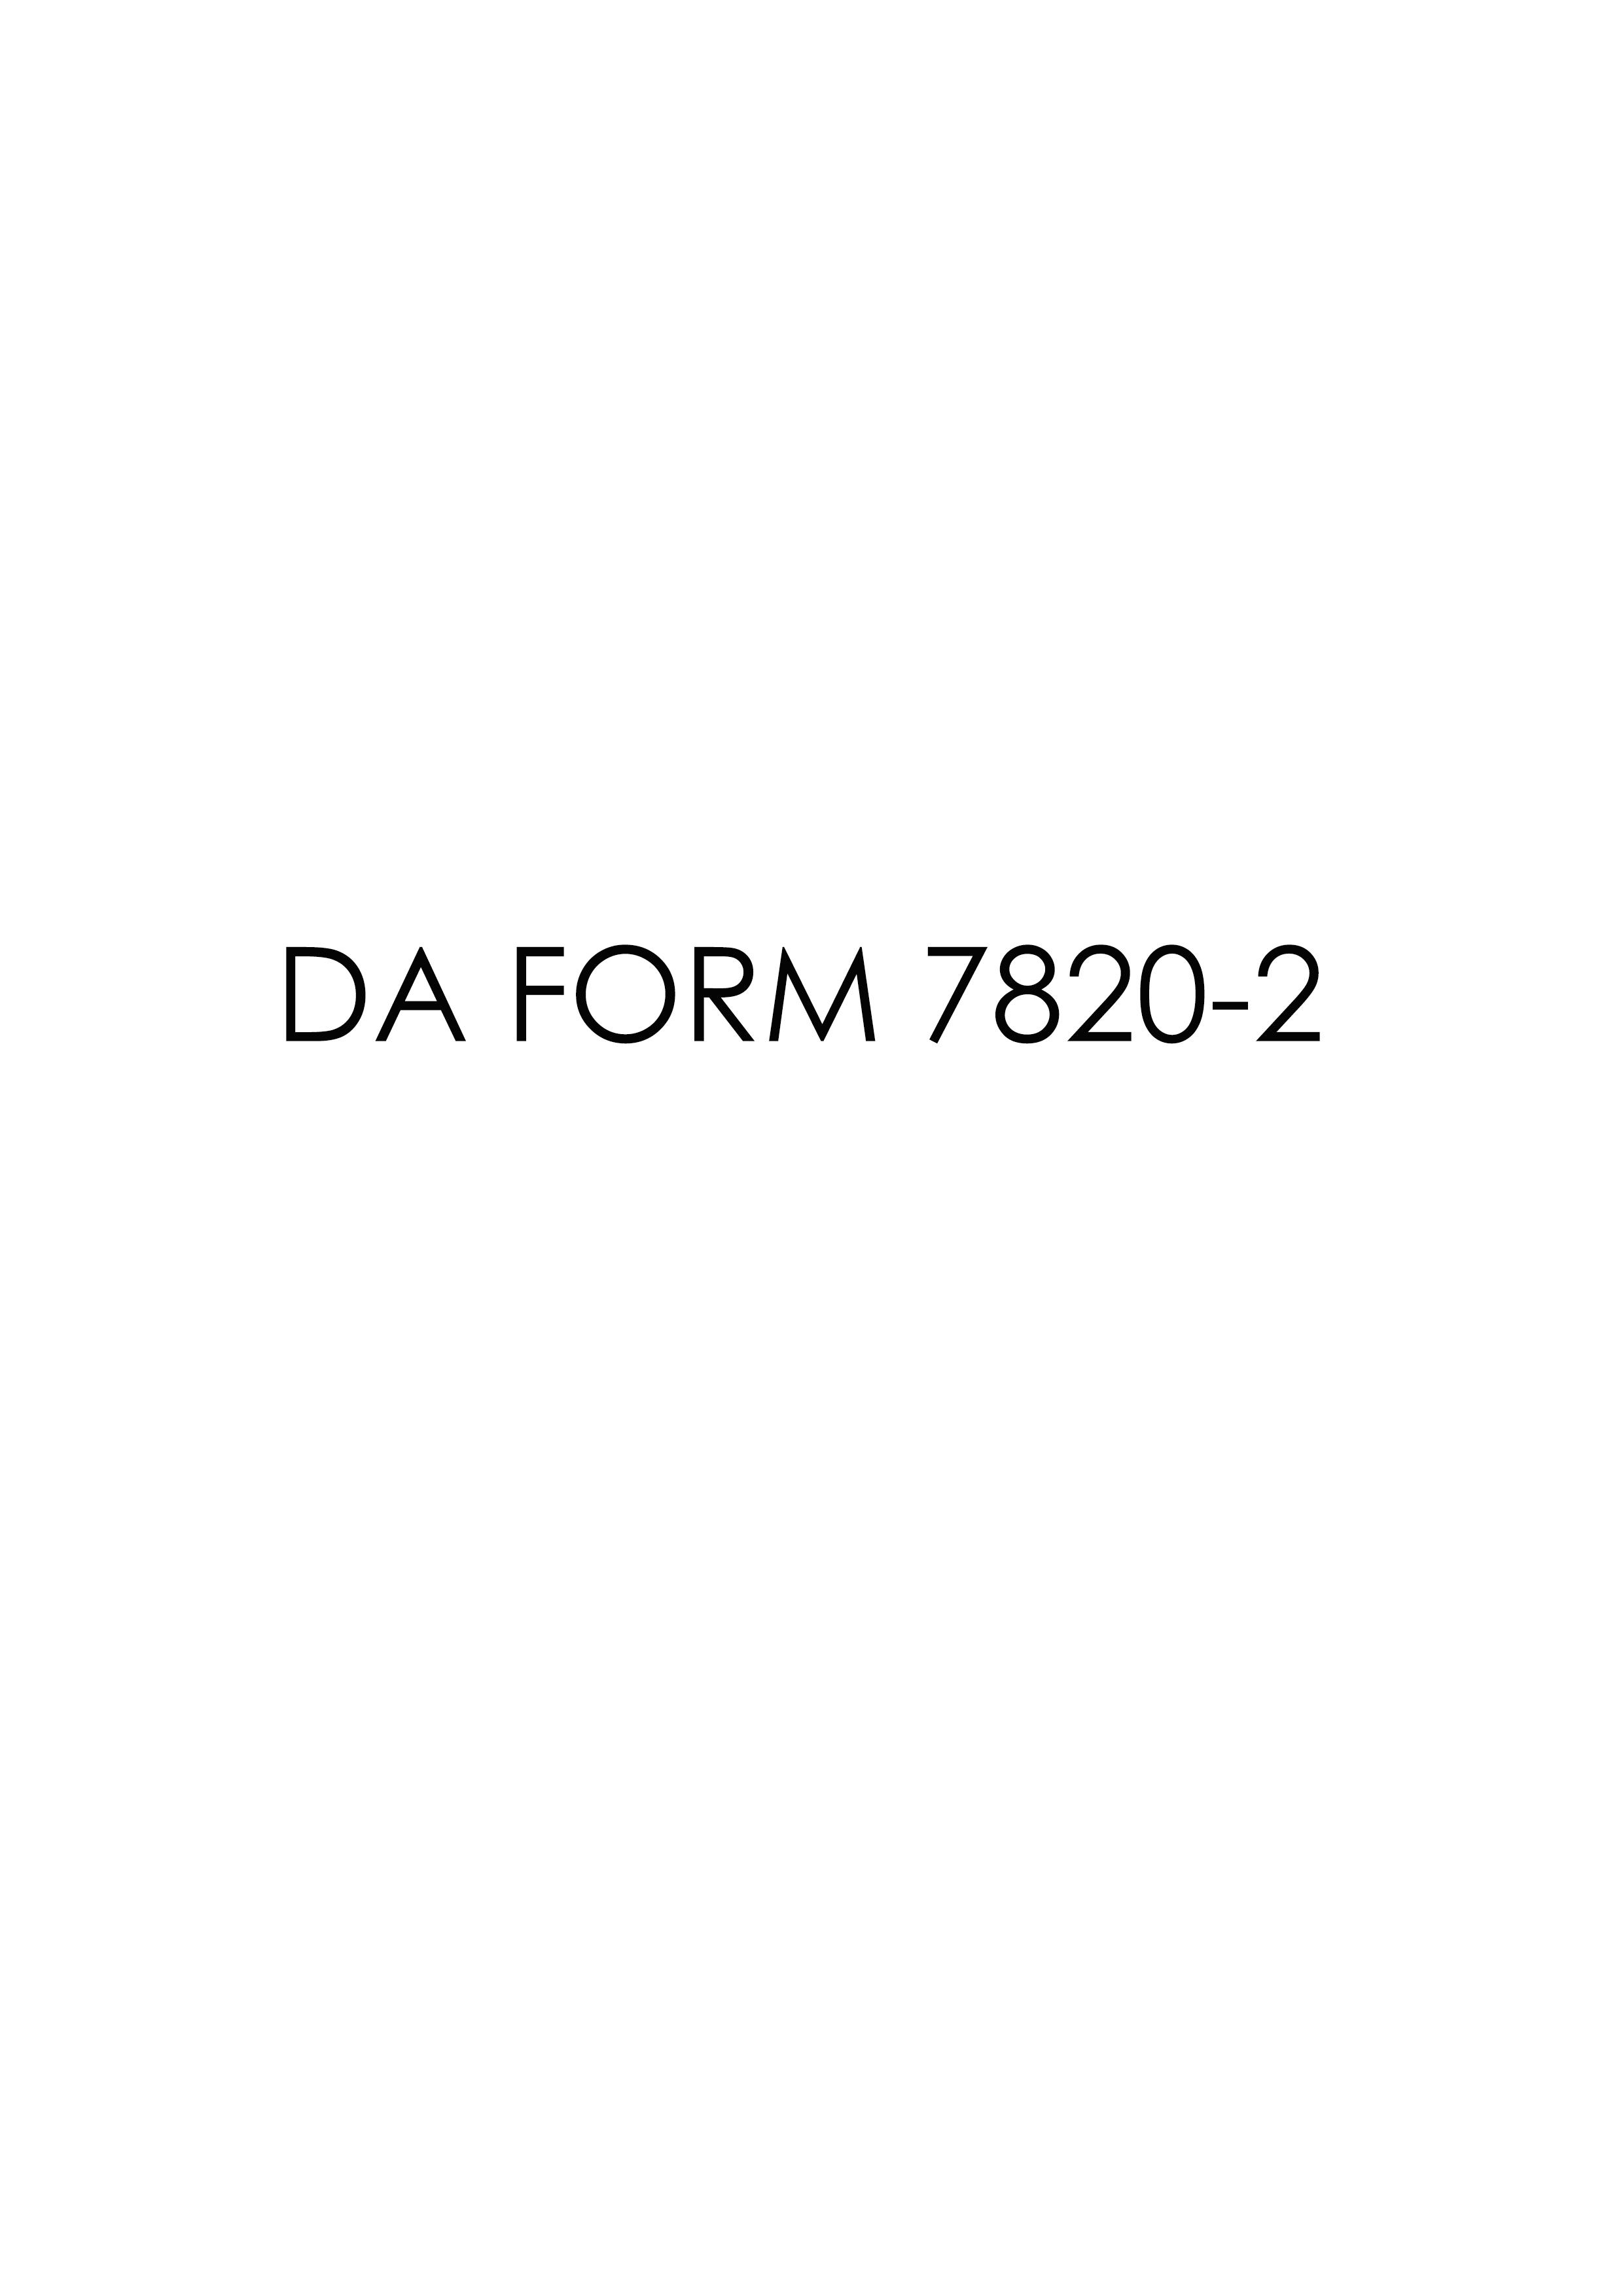 Download da Form 7820-2 Free